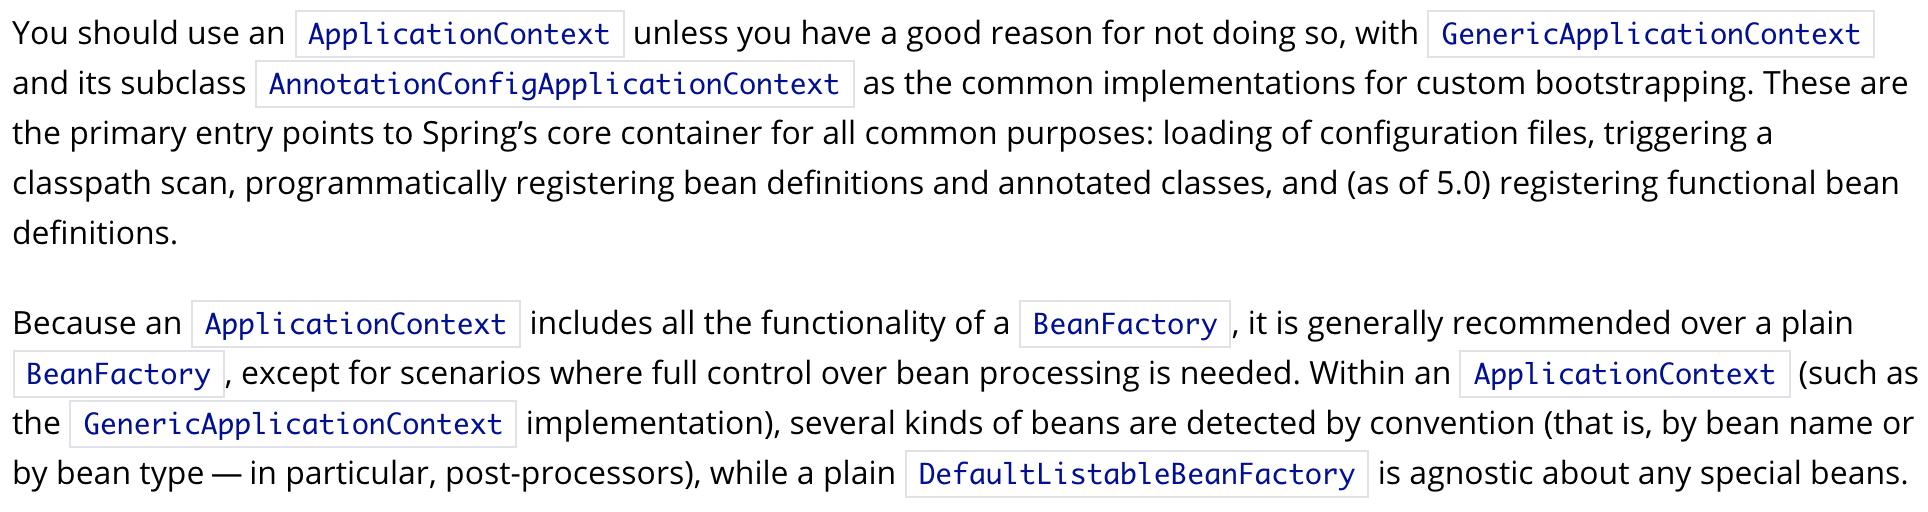 BeanFactory or ApplicationContext